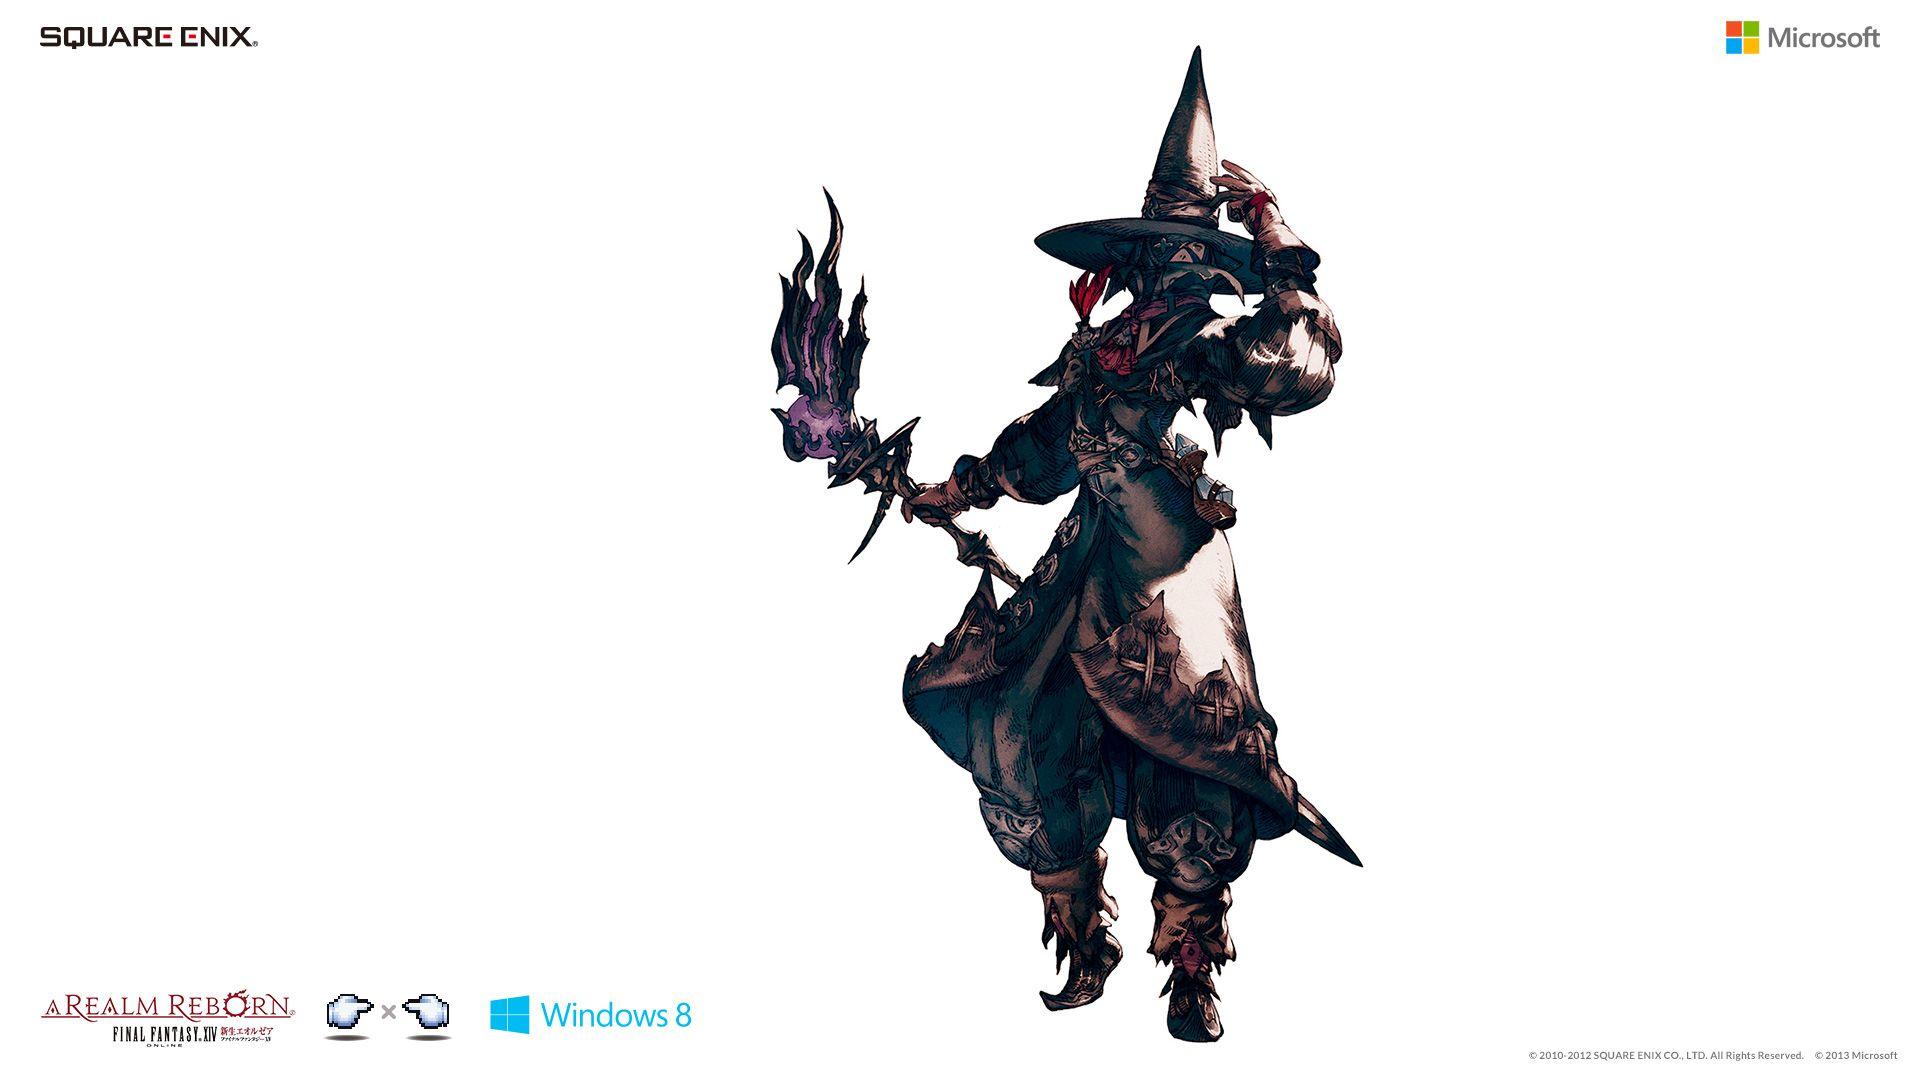 Pin by WillowRaven on GEEK: Final Fantasy XIV: ARR, HW, SB, etc